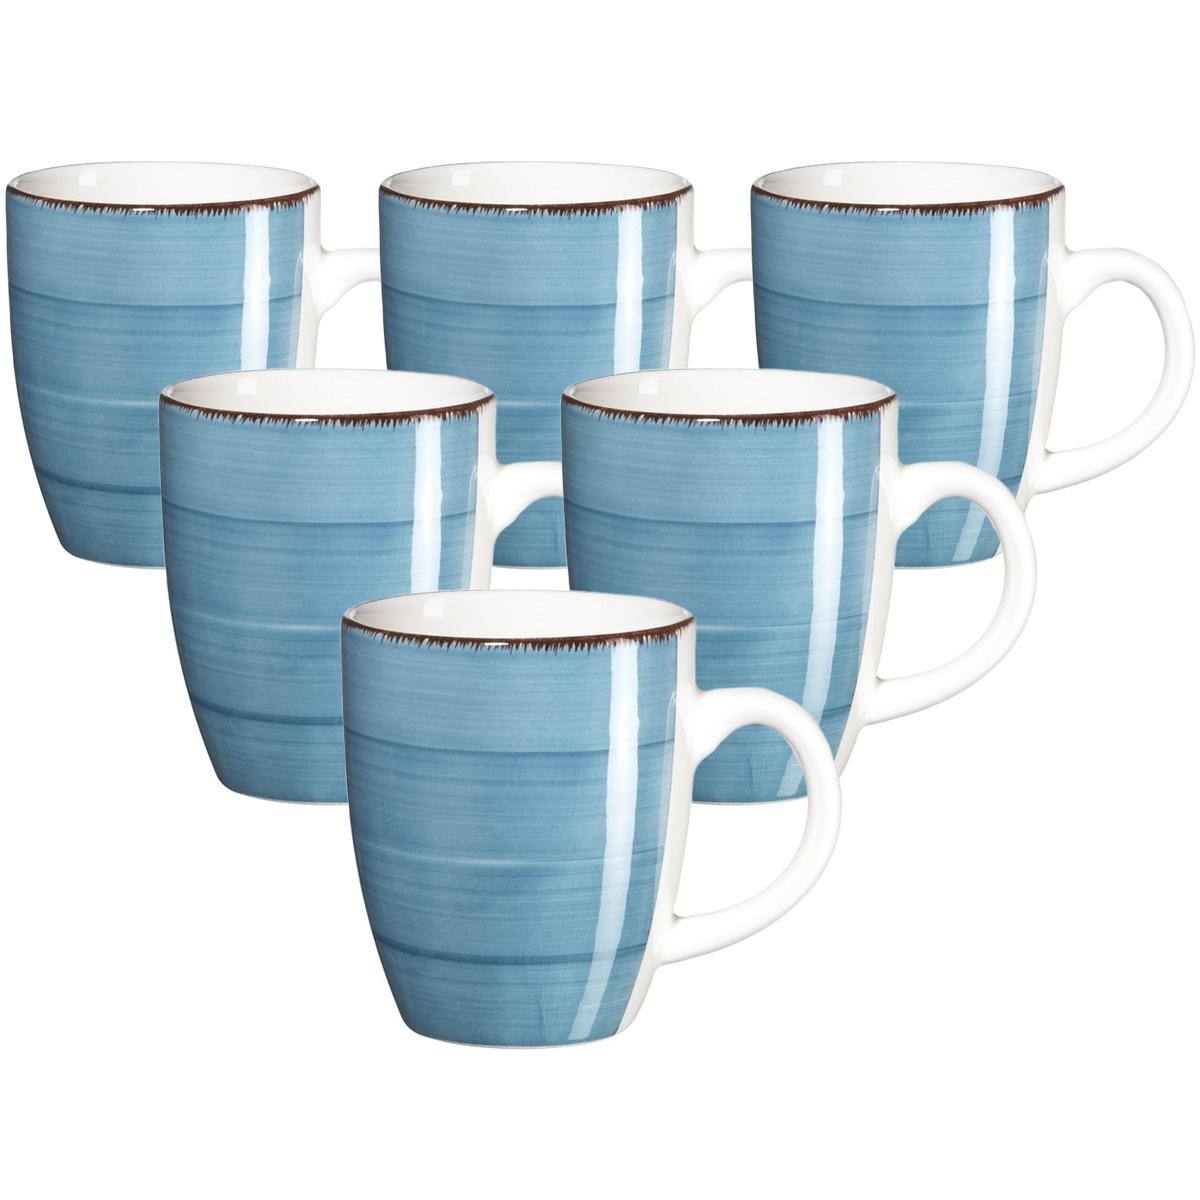 Mäser Sada keramických hrnků Bel Tempo 380 ml, 6 ks, modrá